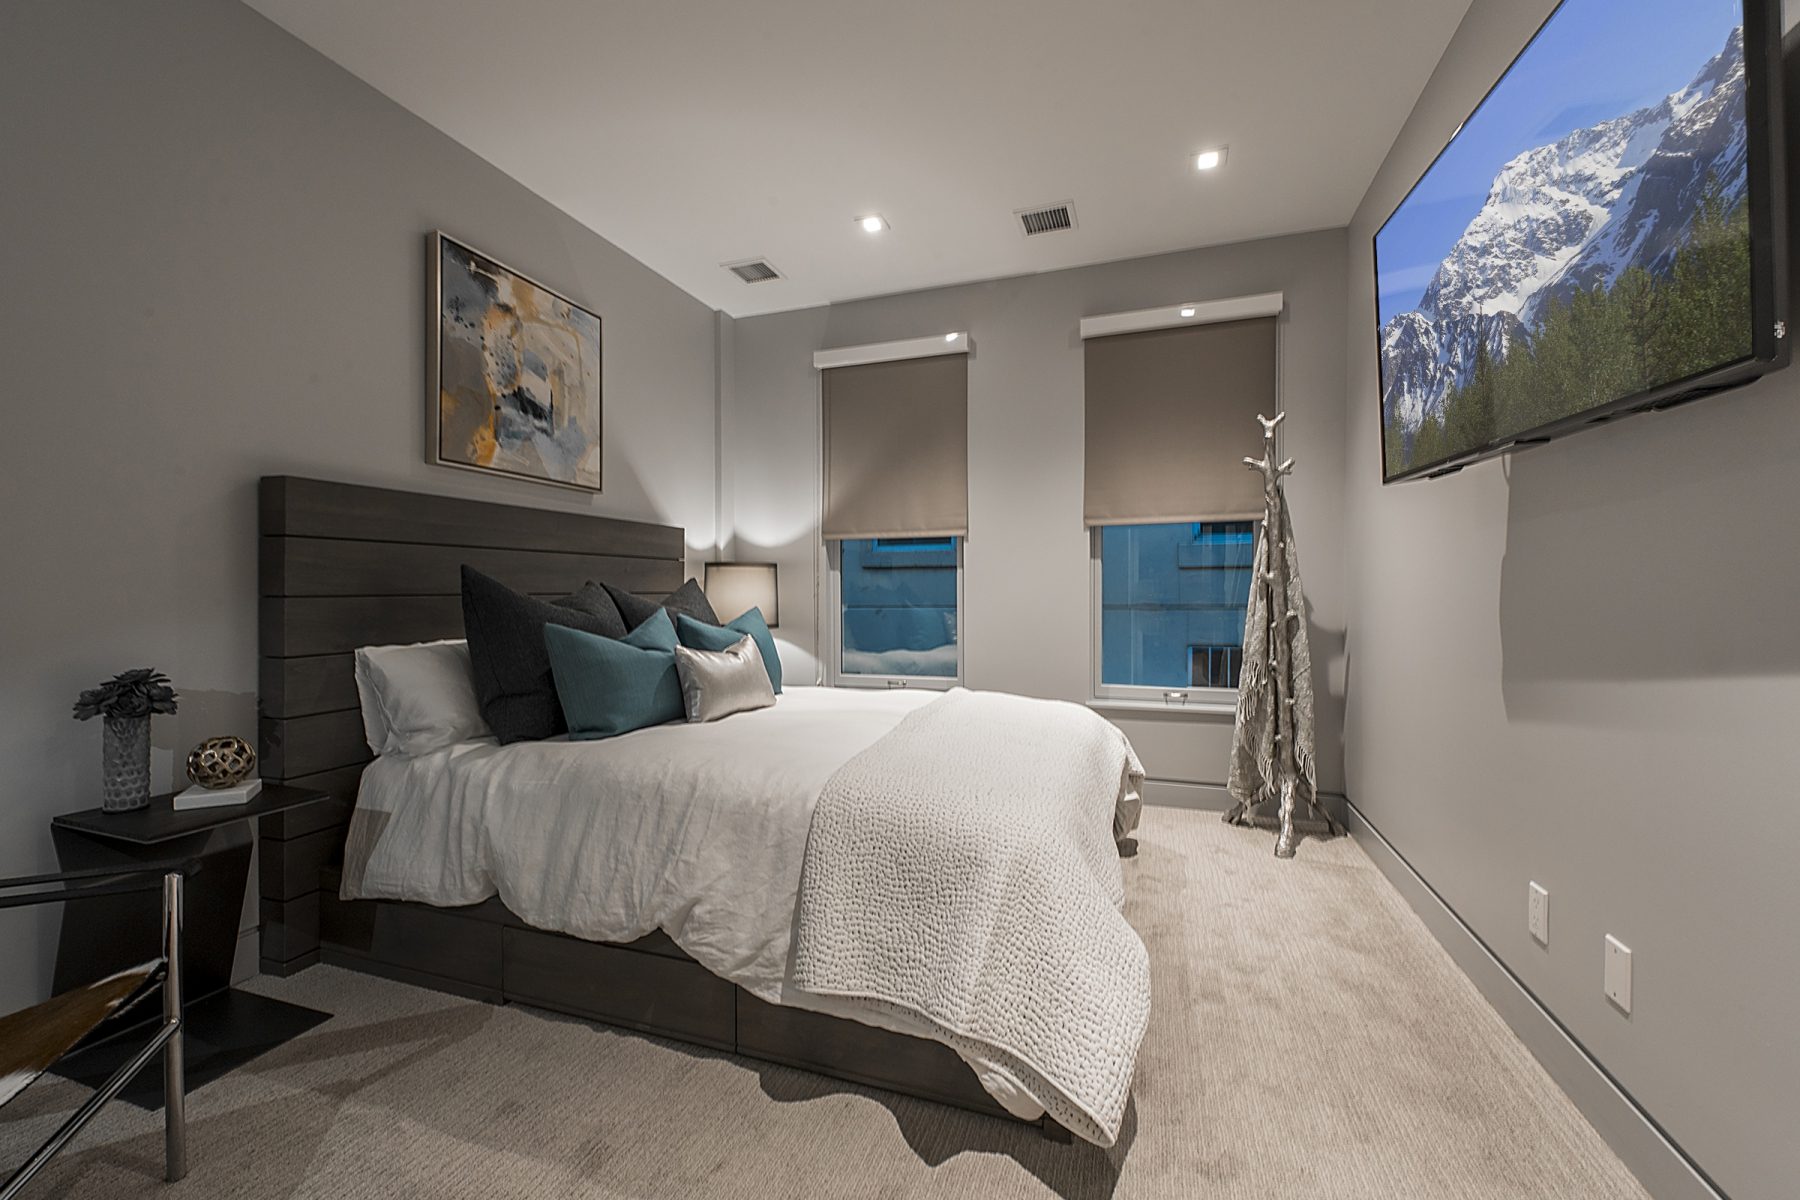 bedroom-four_1800x1200_2443187